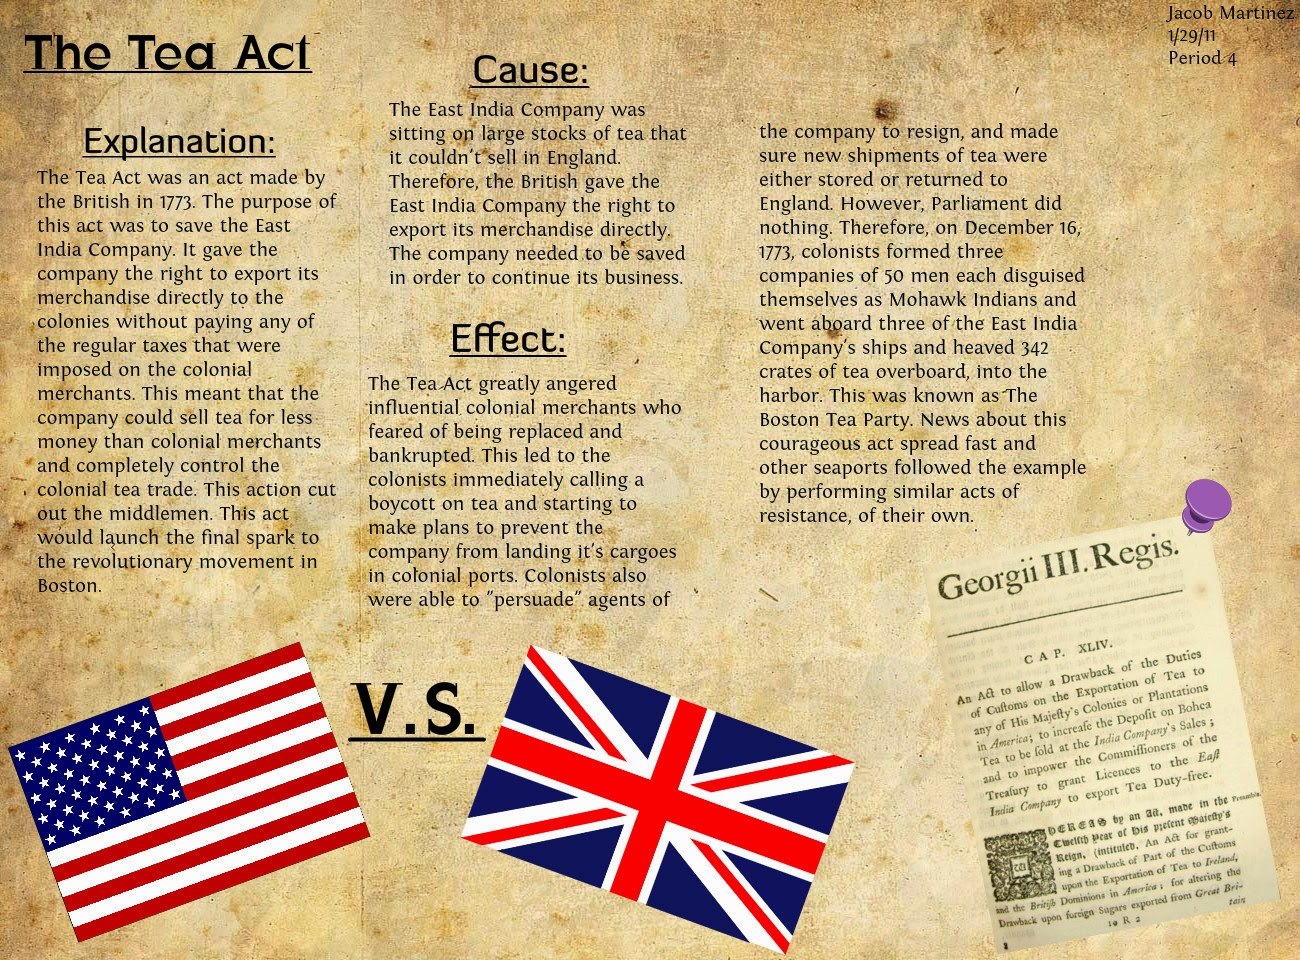 Reformed Anglicans: 27 April 1773 A.D. British Parliament passes ...